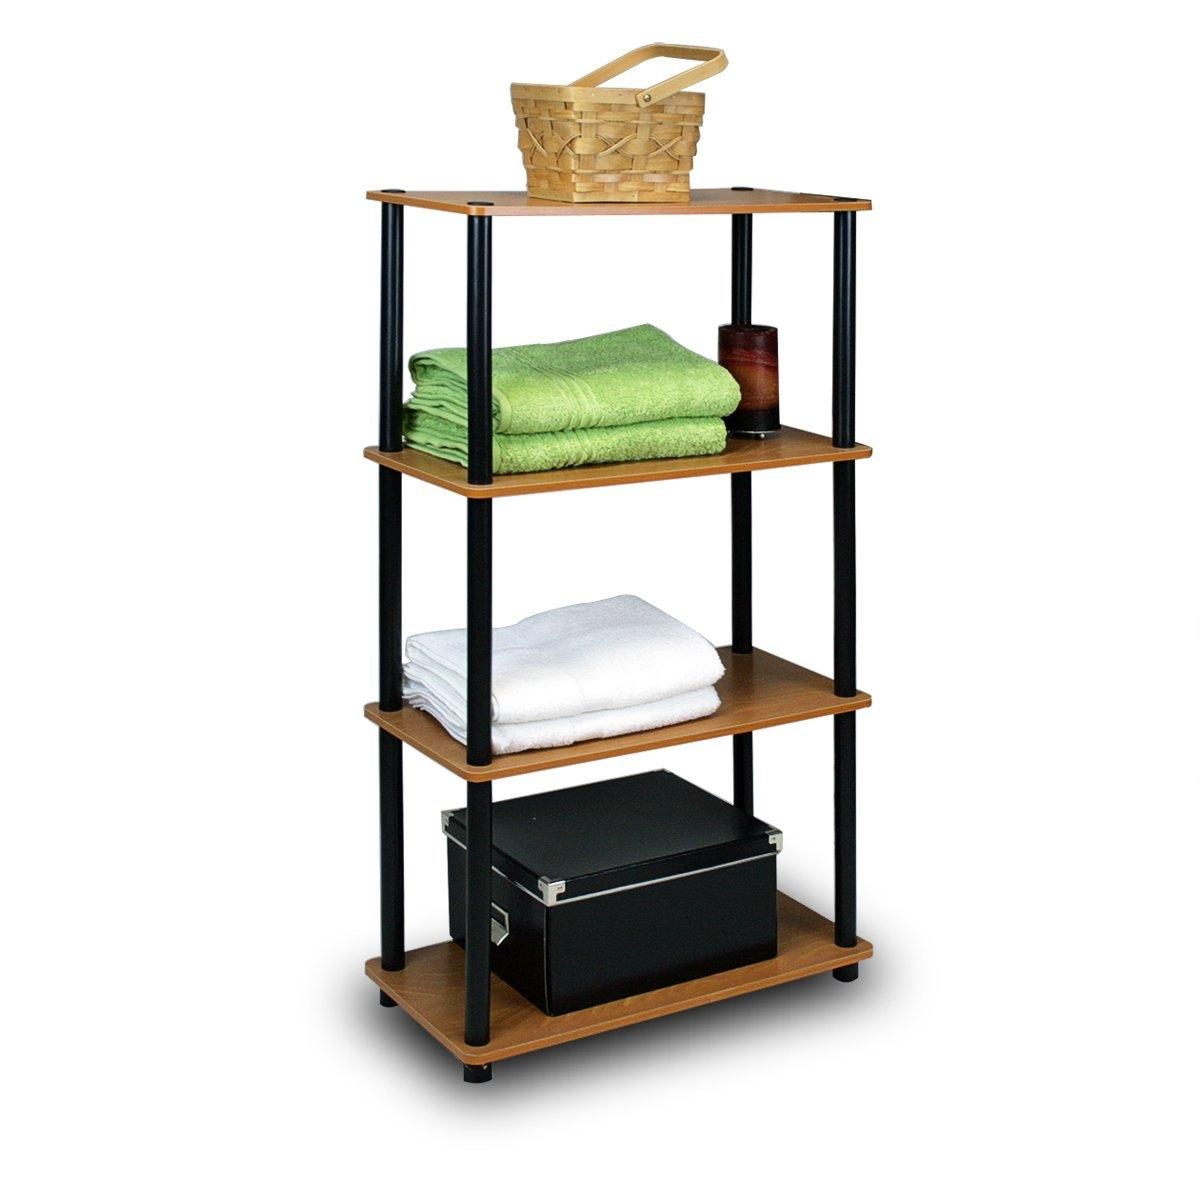 4-Tier Storage Shelf Display Rack Bookcase in Cherry Finish